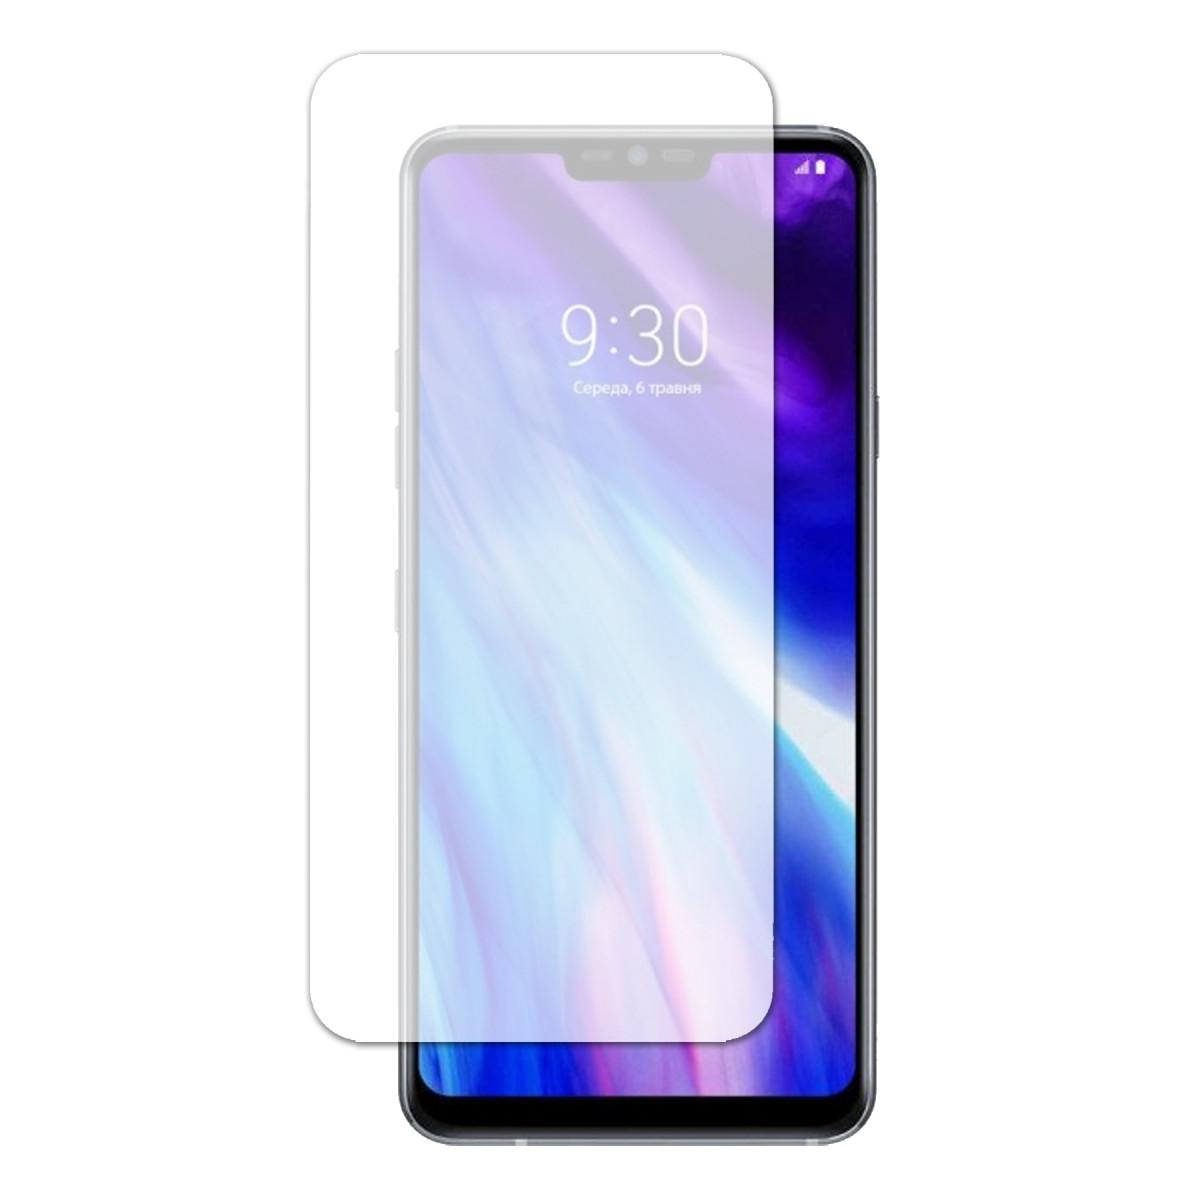 Гидрогелевая защитная пленка для смартфонов LG (Q7 Plus/K9/QStylus Plus/G7 One/G7 Fit/G8 ThinQ/V40 ThinQ и